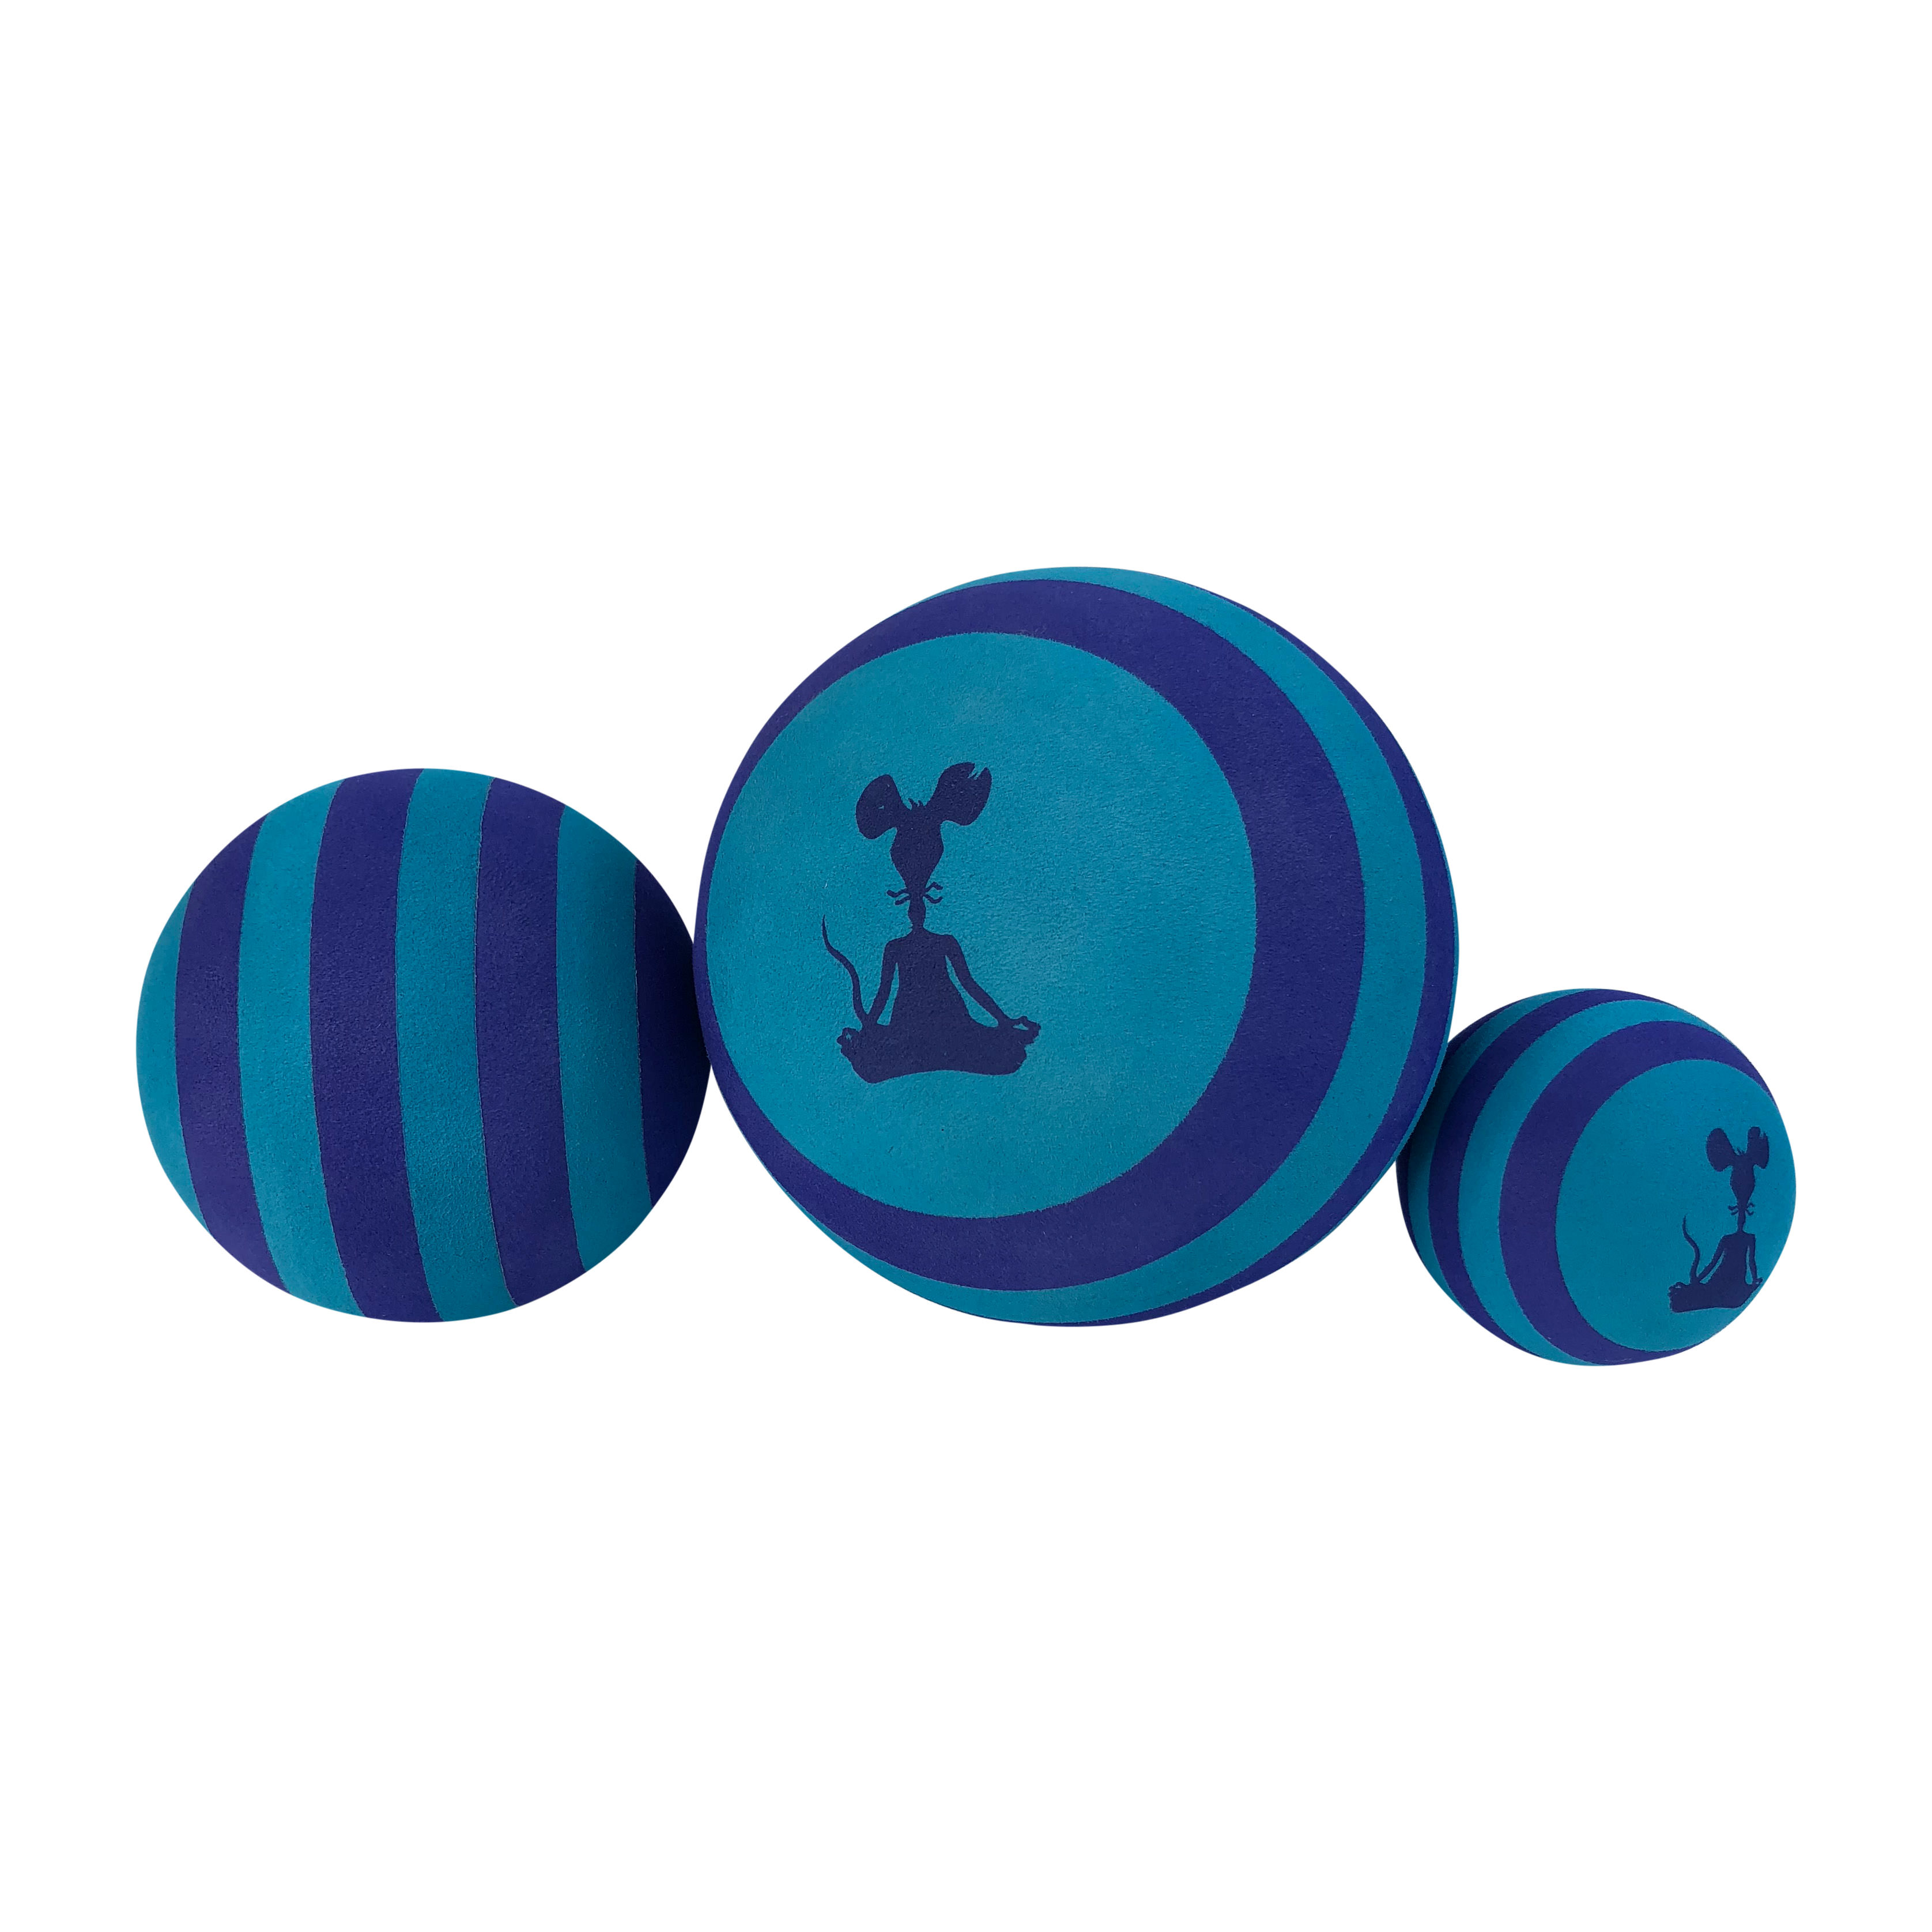 YogaRat Set of 3 Exercise Massage Therapy Balls, Blue/Black